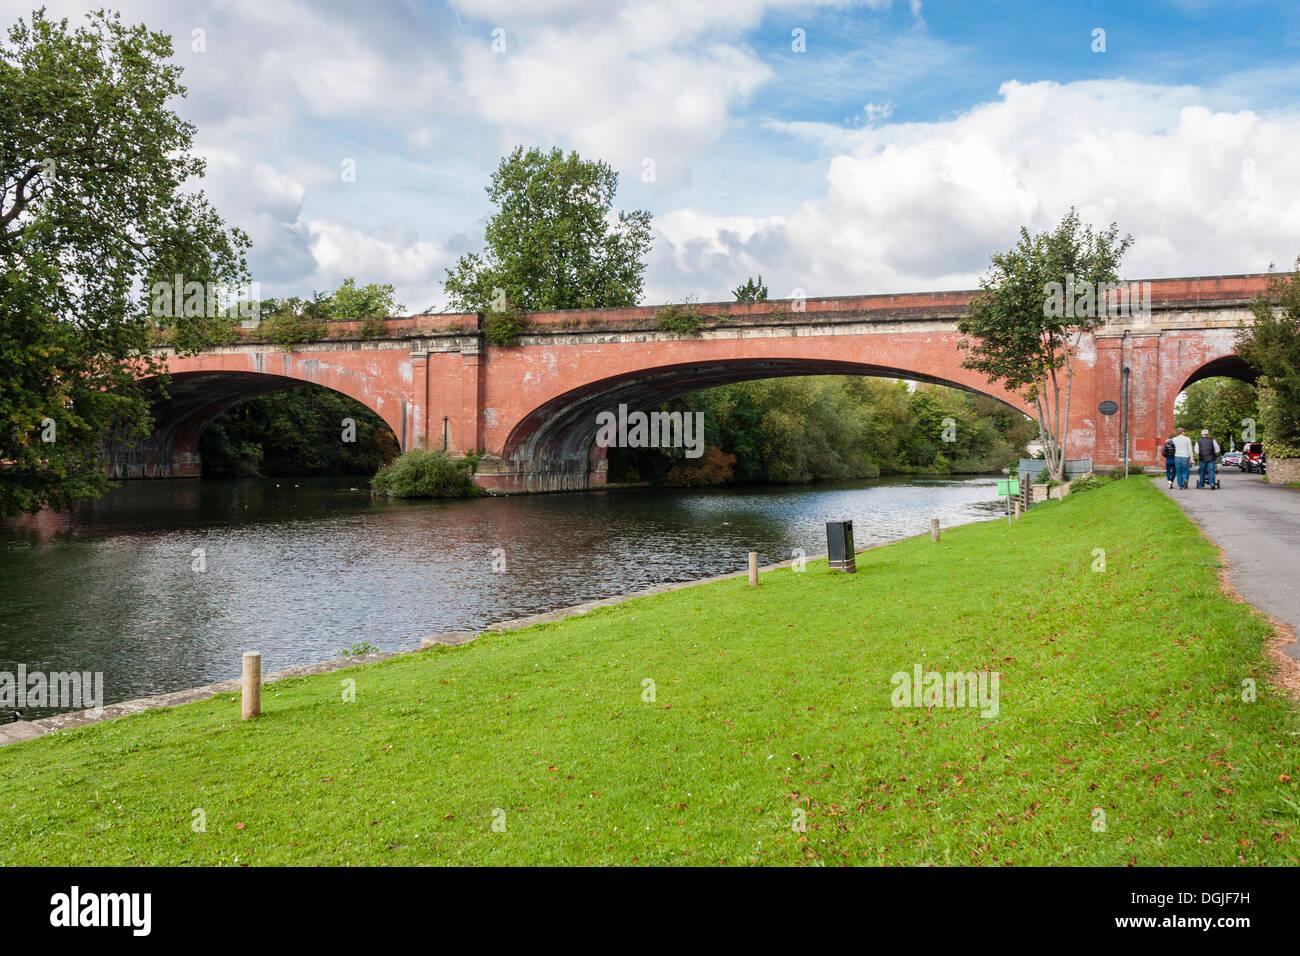 Maidenhead railway bridge, designed by Isambard Kingdom Brunel Stock Photo